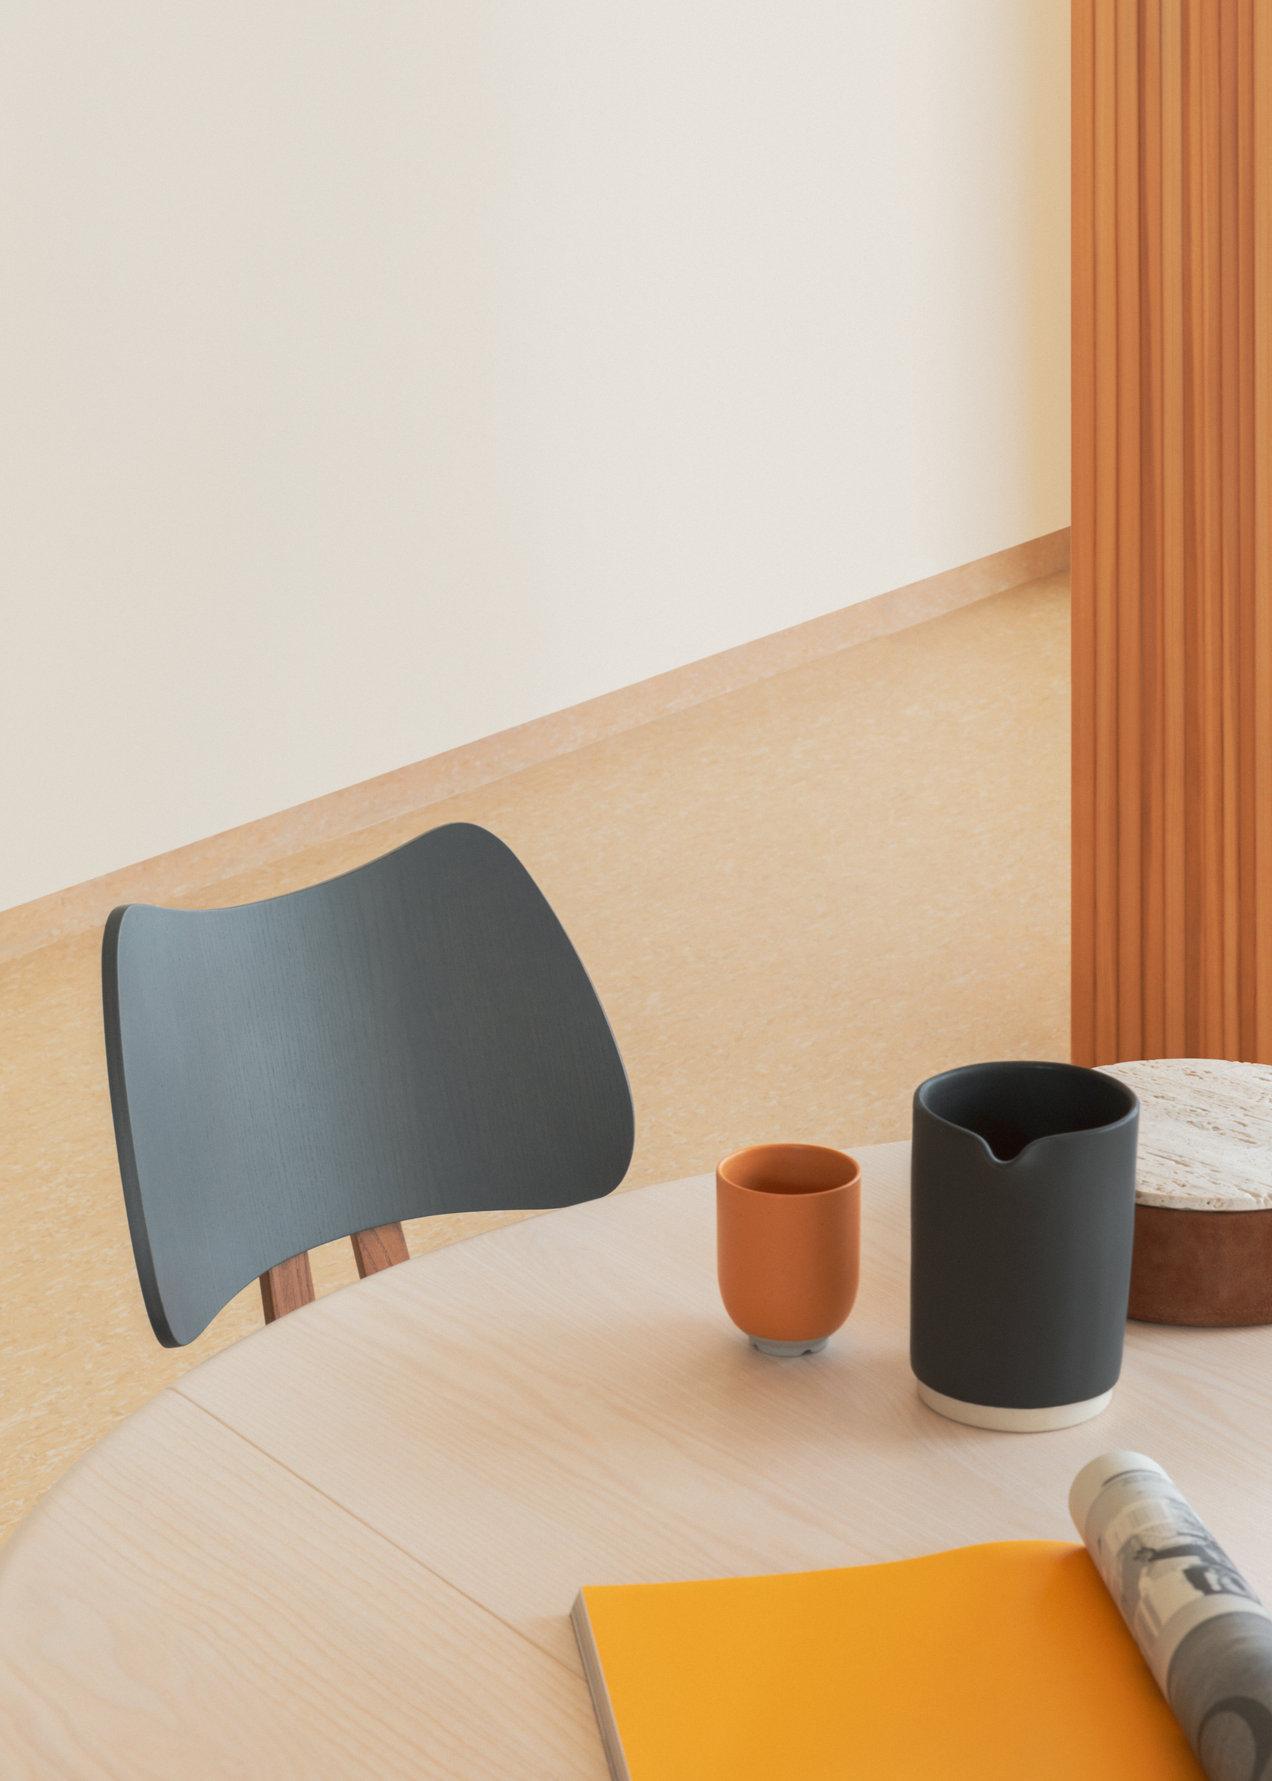 Originals--7402--butterfly-chair--gallerySlider-2--Ash--WGOG.png